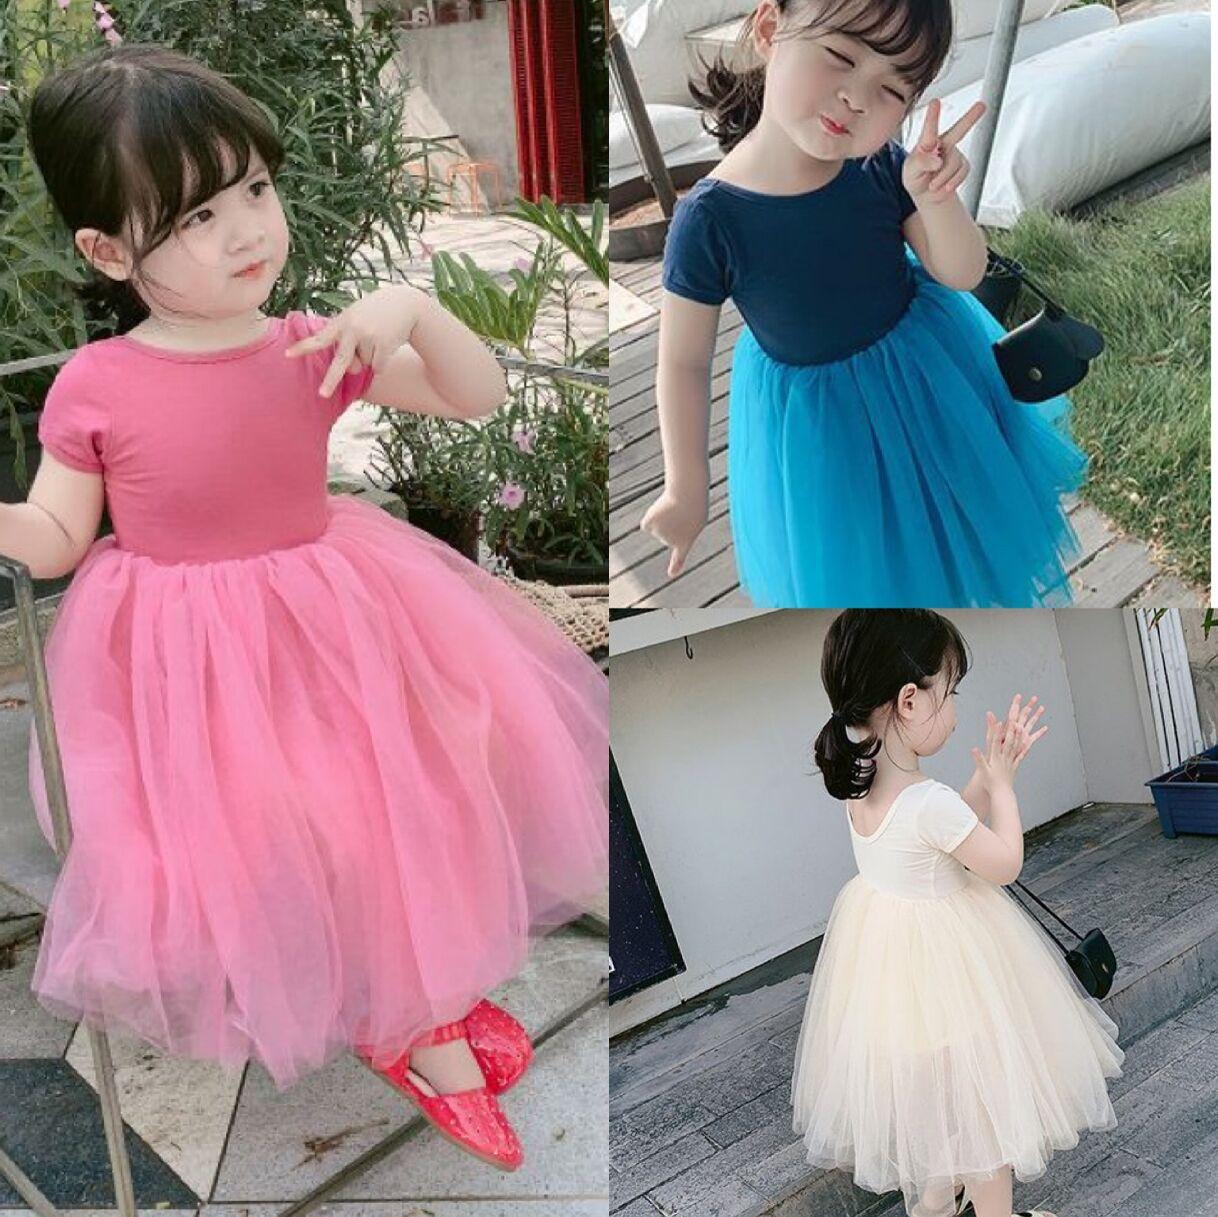 INS Baby Girl Tutu Dresses Kid Off Shoulder Summer Party Elegant Solid Color Agaric Lace Gauze Skirt 3 colors